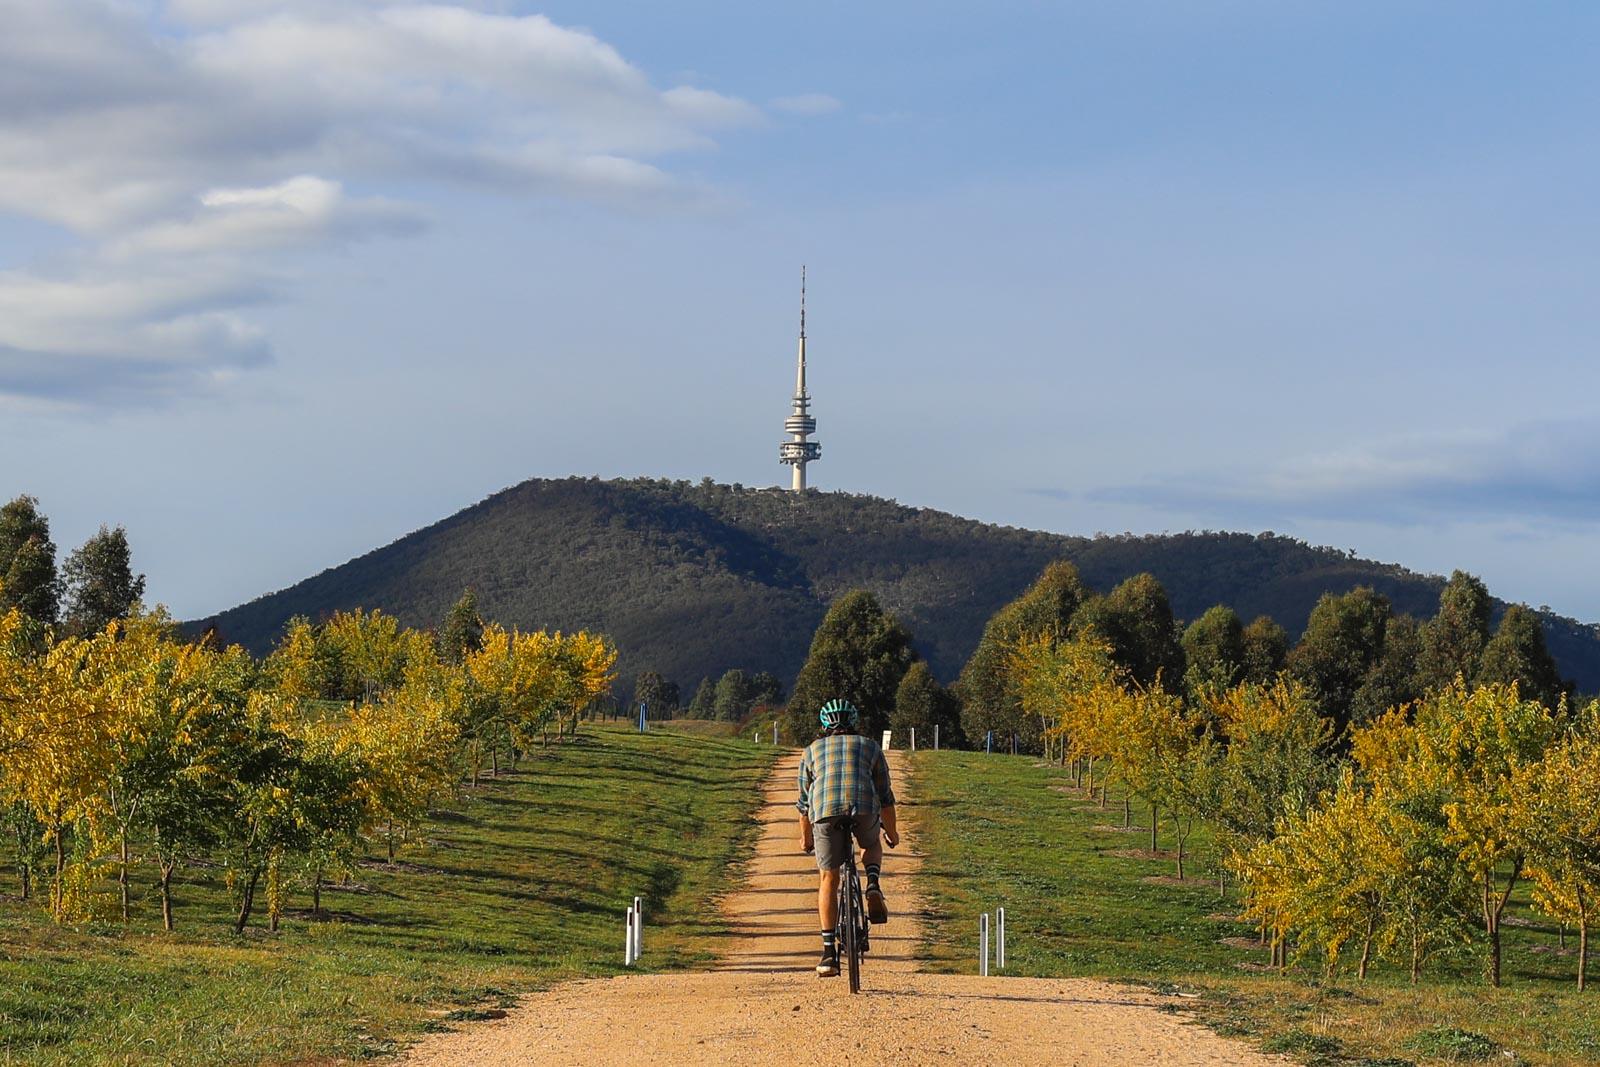 Iconic Canberra